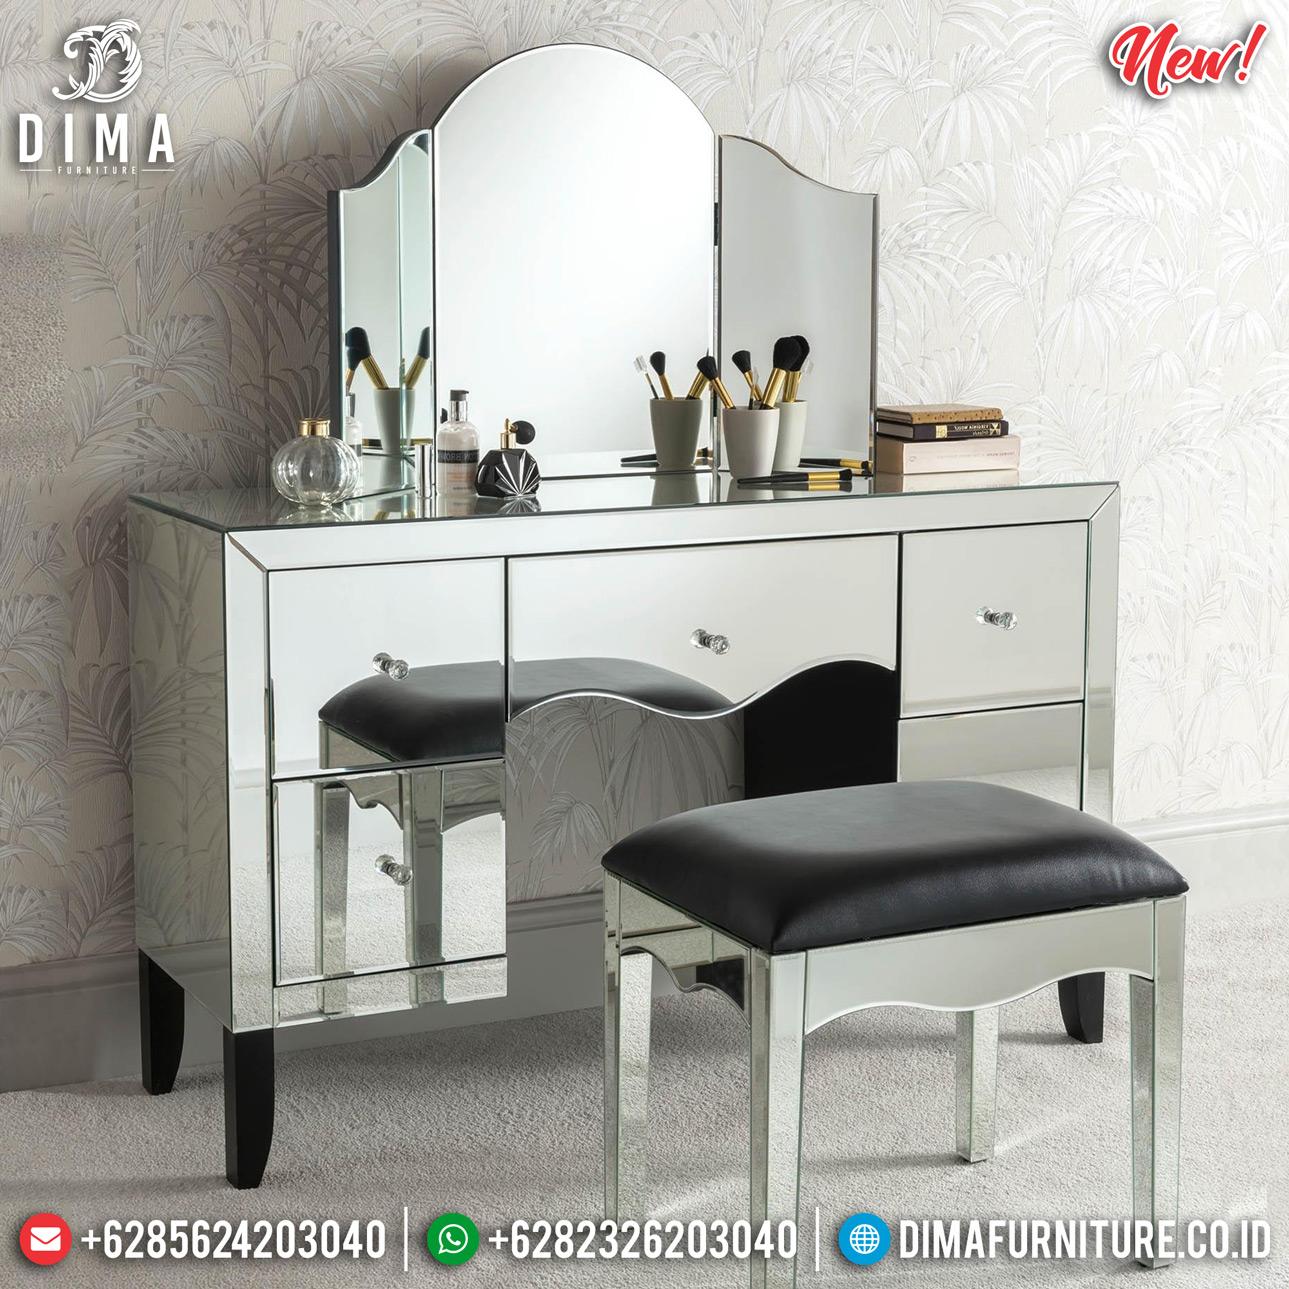 New Meja Rias Minimalis Modern Desain Vanity Room Inspiring BT-0724